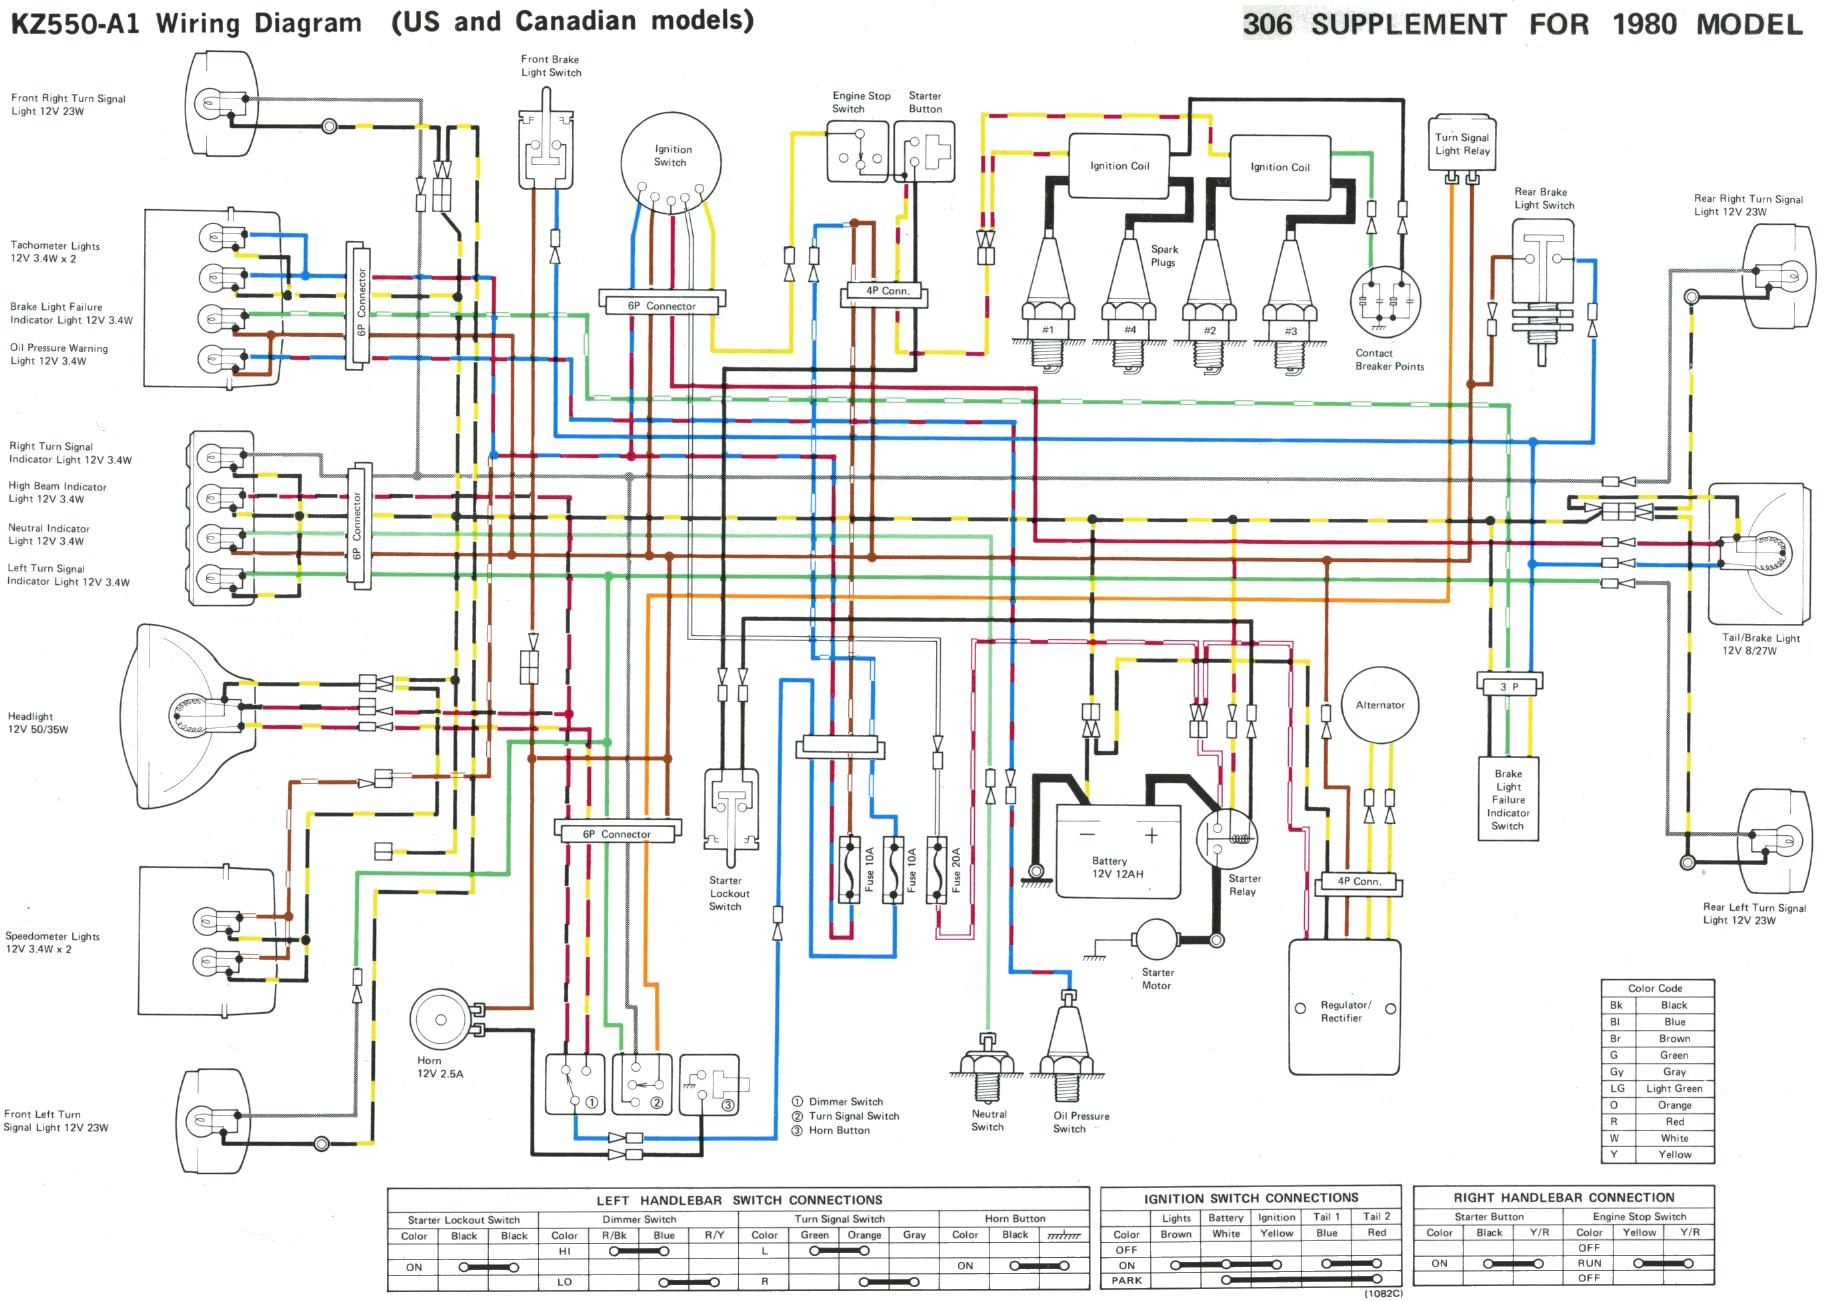 kawasaki kz550 easy wiring diagram wiring diagram 1981 kz550 ltd wiring diagram schematics wiring diagramkz550 wiring diagram solution of your wiring diagram guide